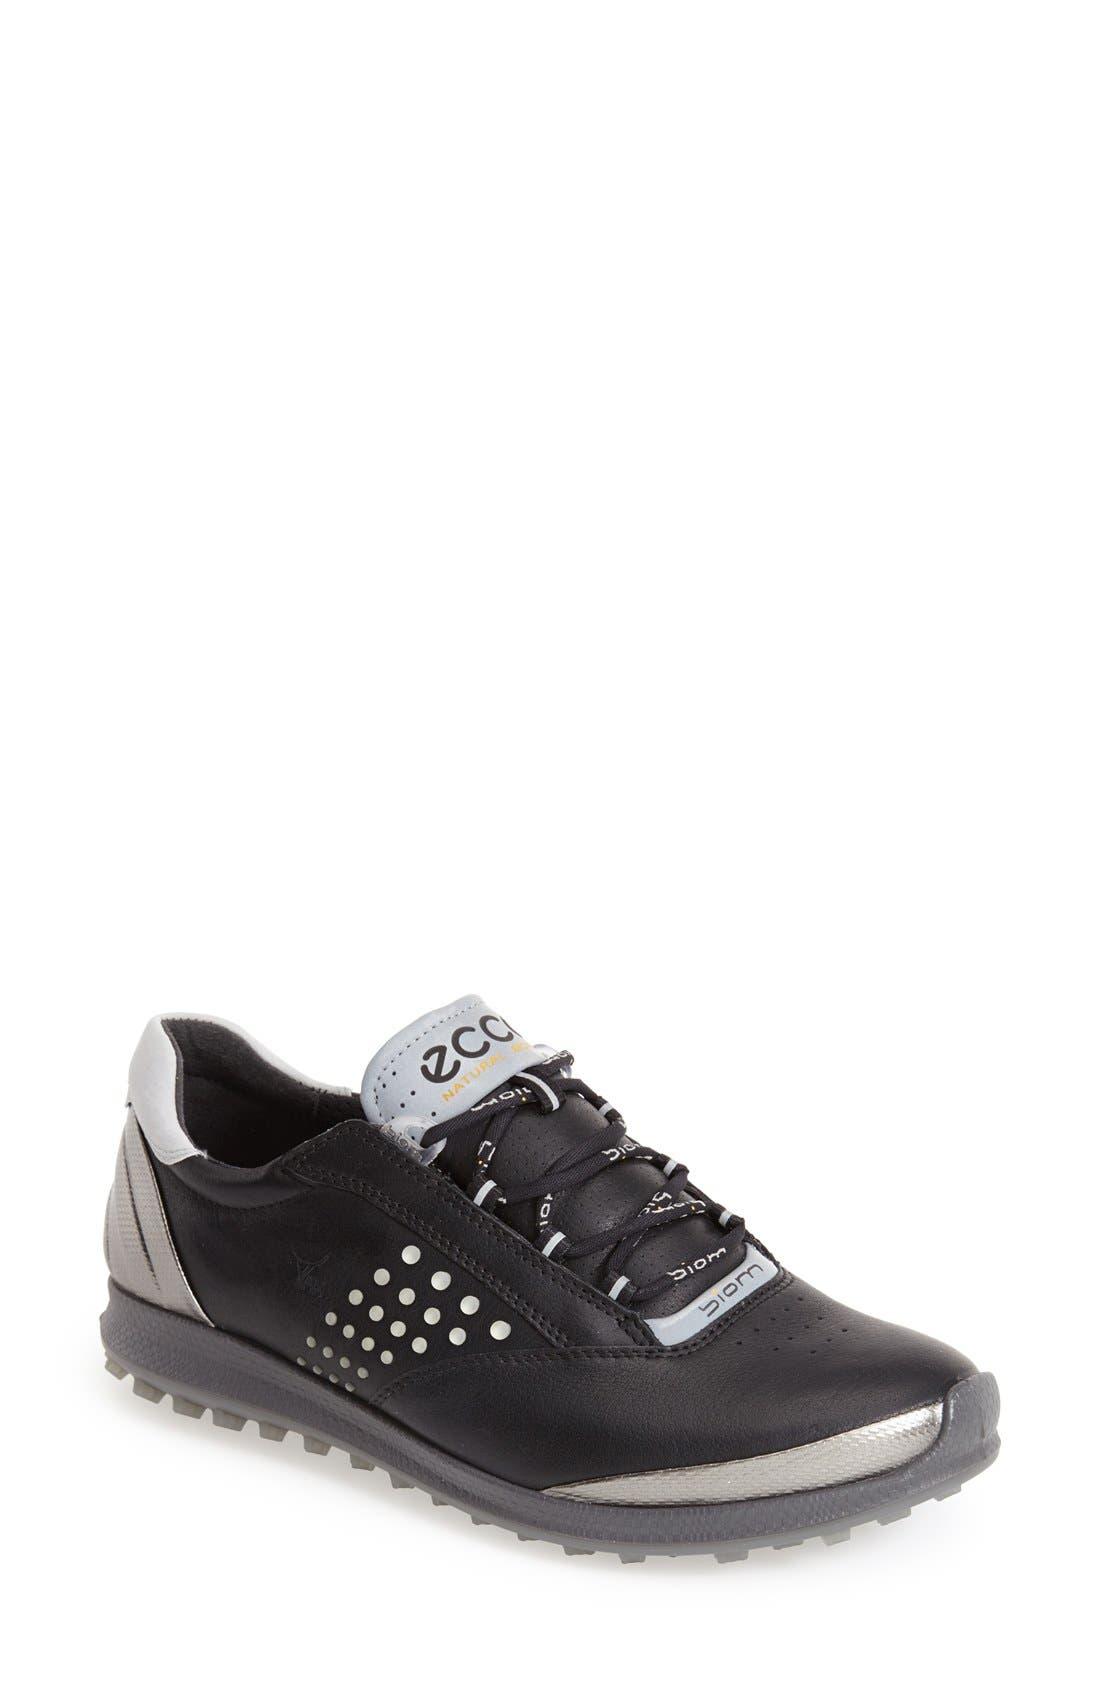 'BIOM' Hydromax<sup>®</sup> Waterproof Golf Shoe,                         Main,                         color,